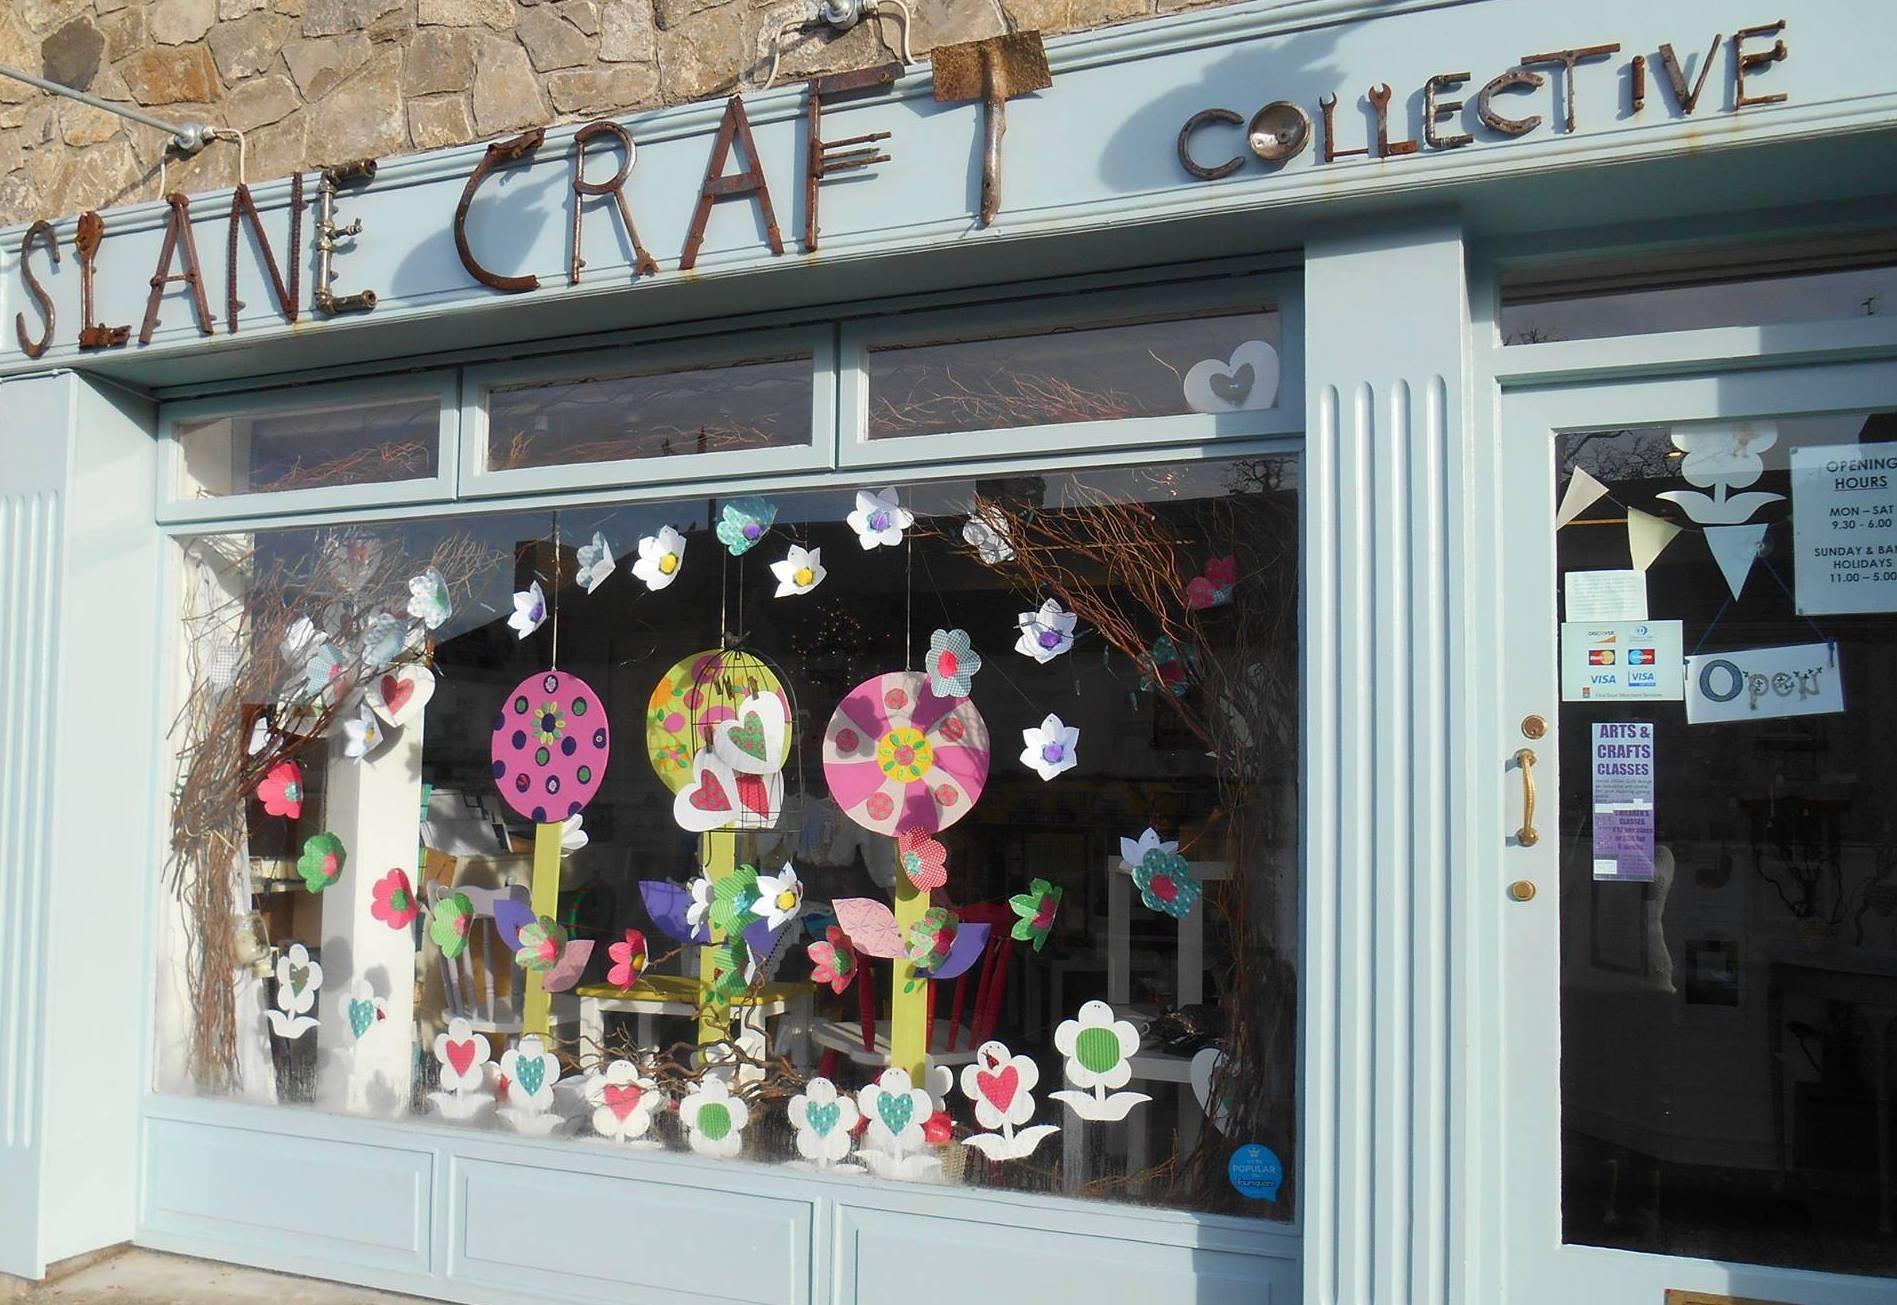 Slane Craft Collective, Main Street Slane